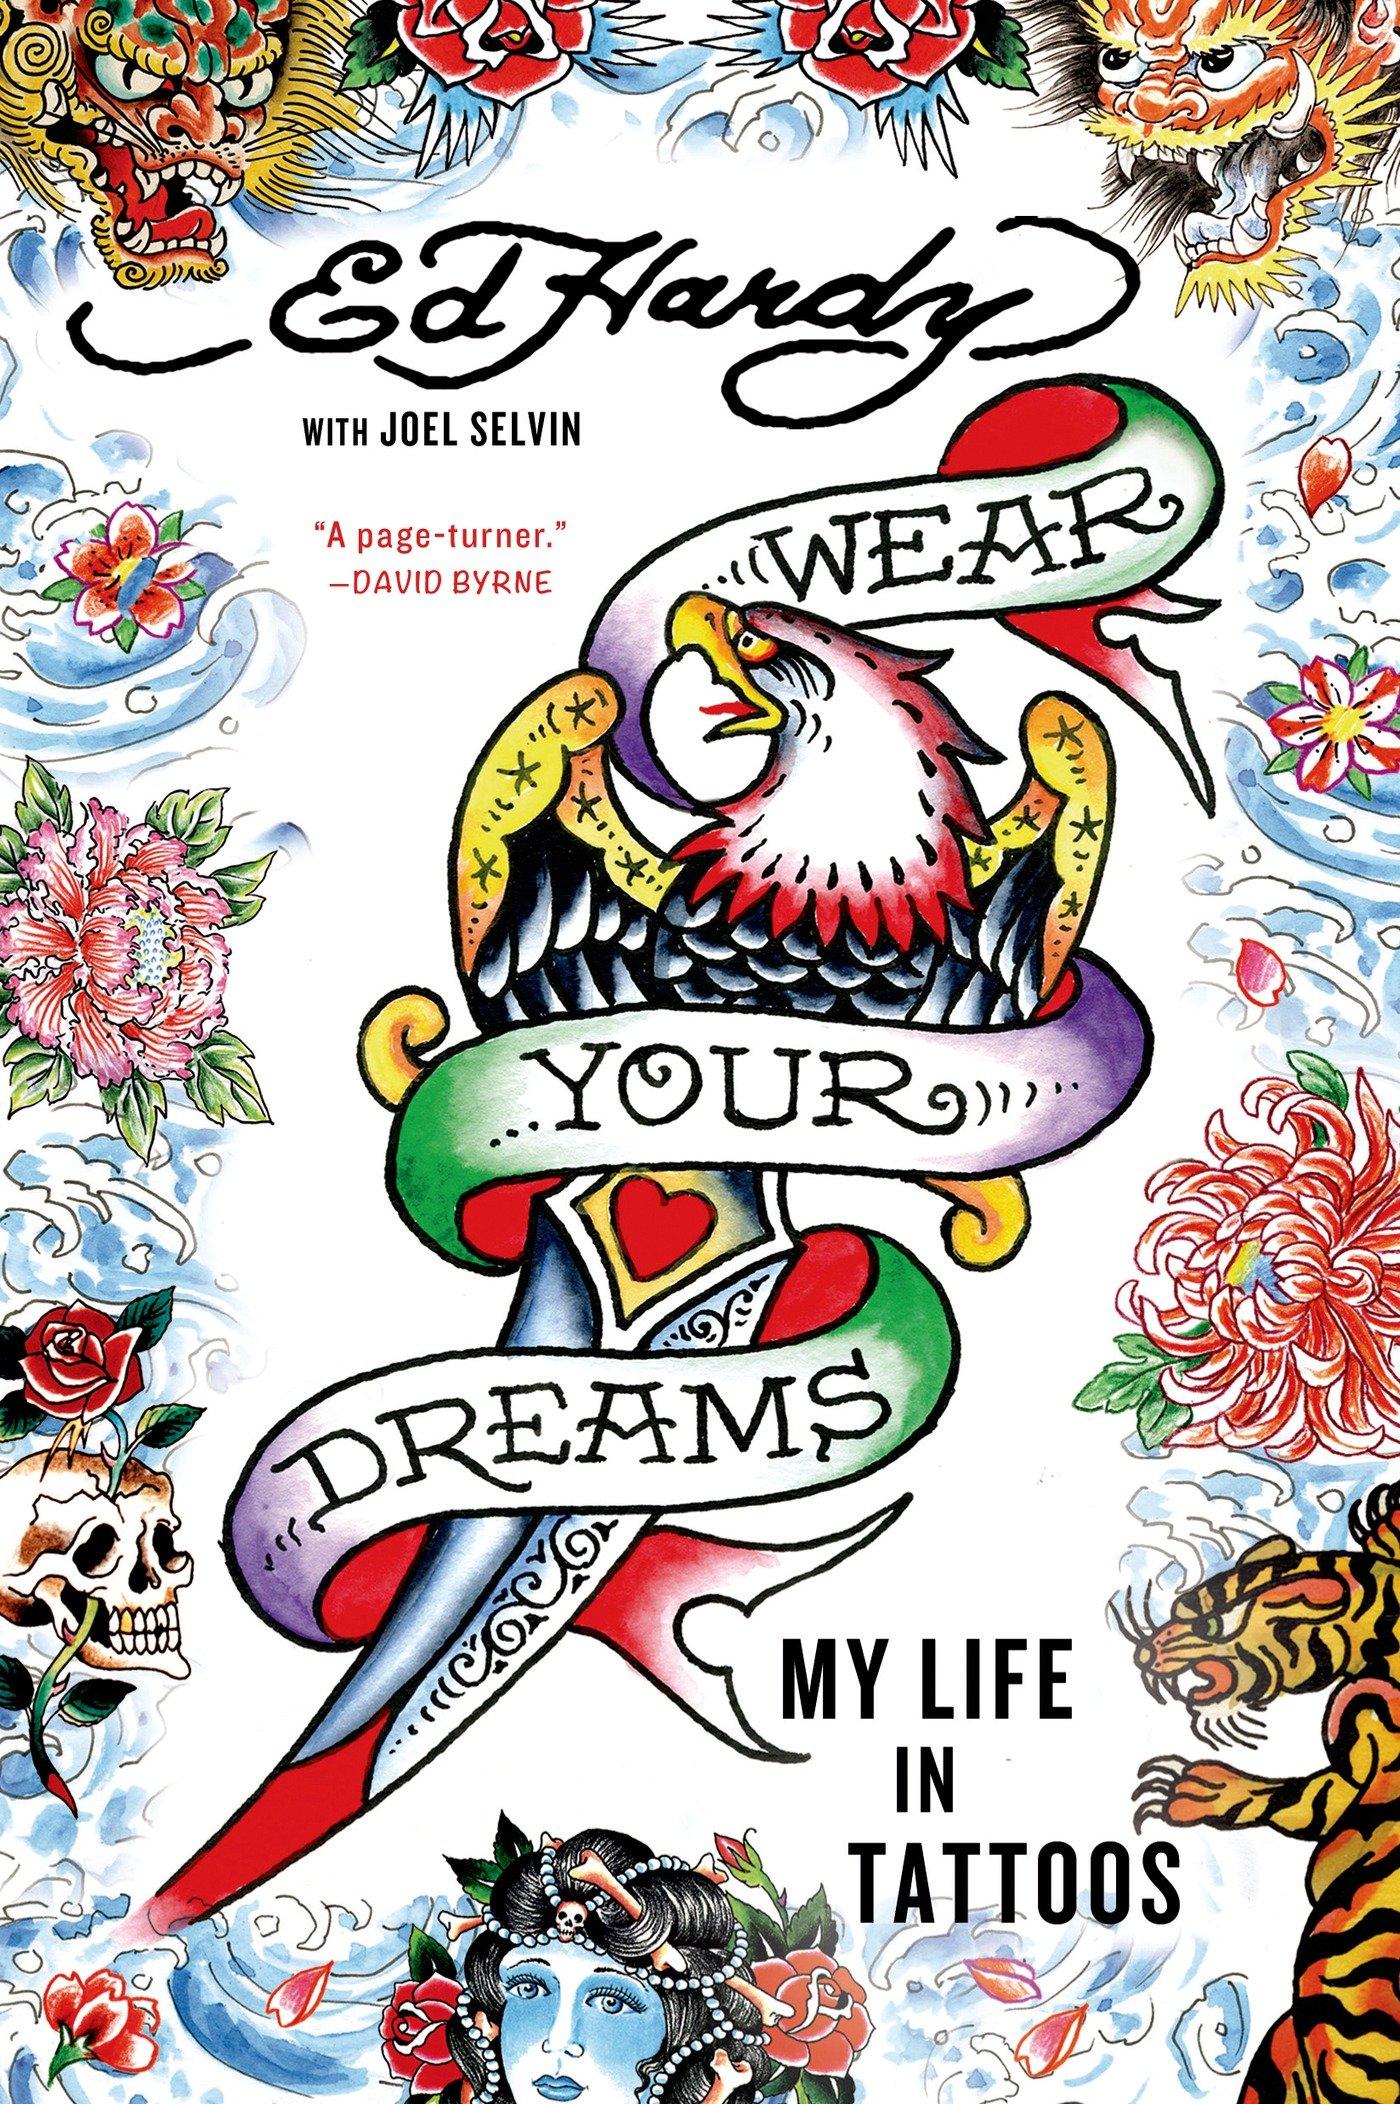 Wear Your Dreams: My Life in Tattoos: Ed Hardy, Joel Selvin: Amazon ...